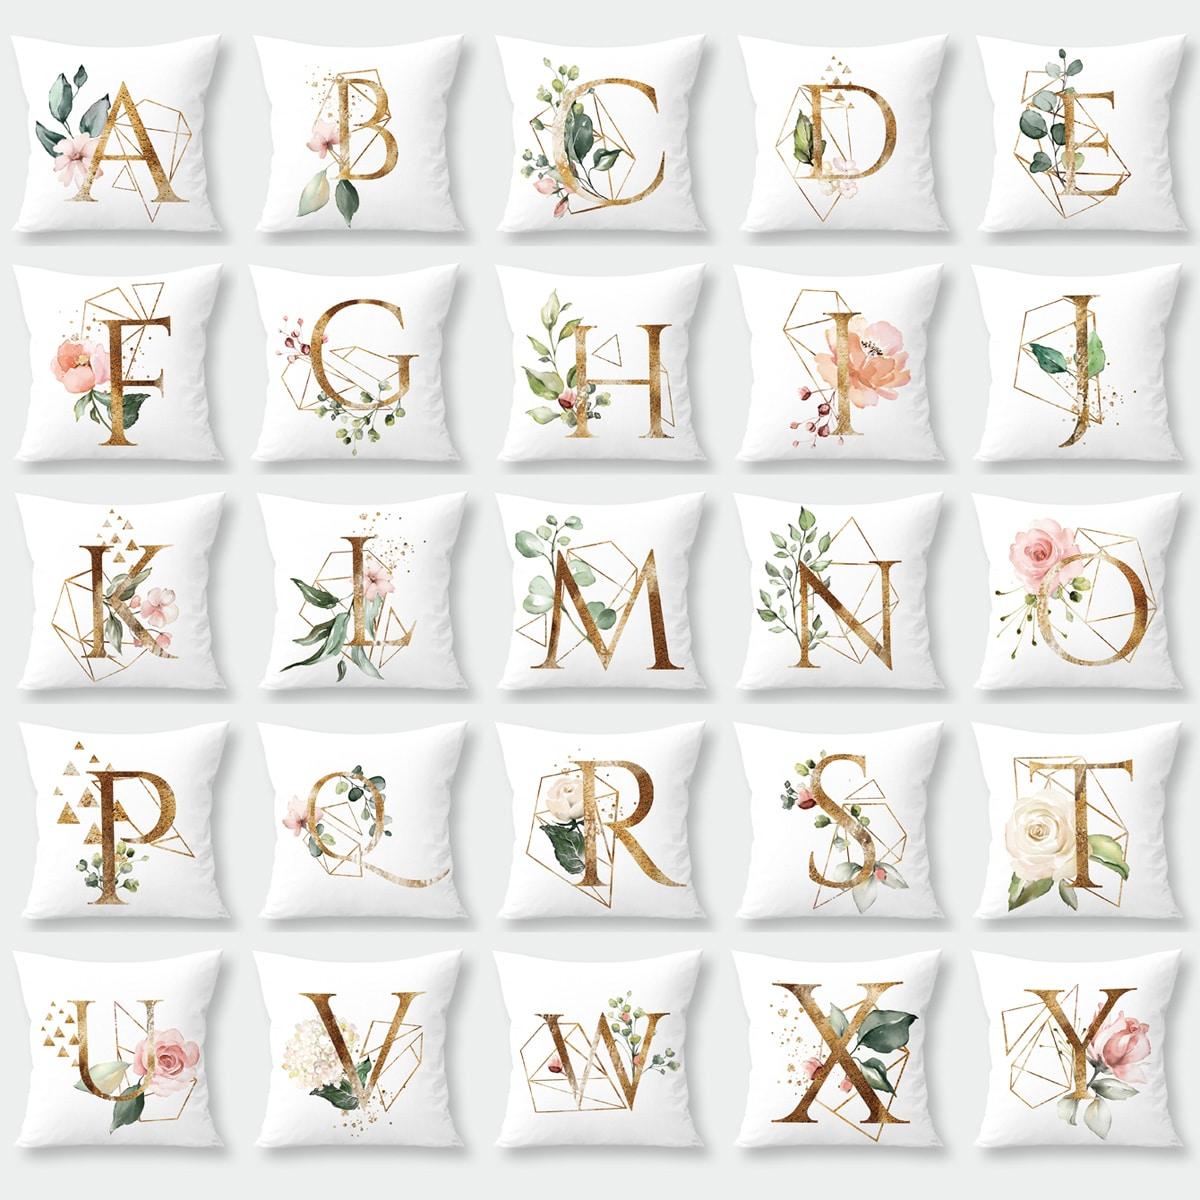 Kussenhoes 1 st Letter & Bloemen & Geometrisch patroon